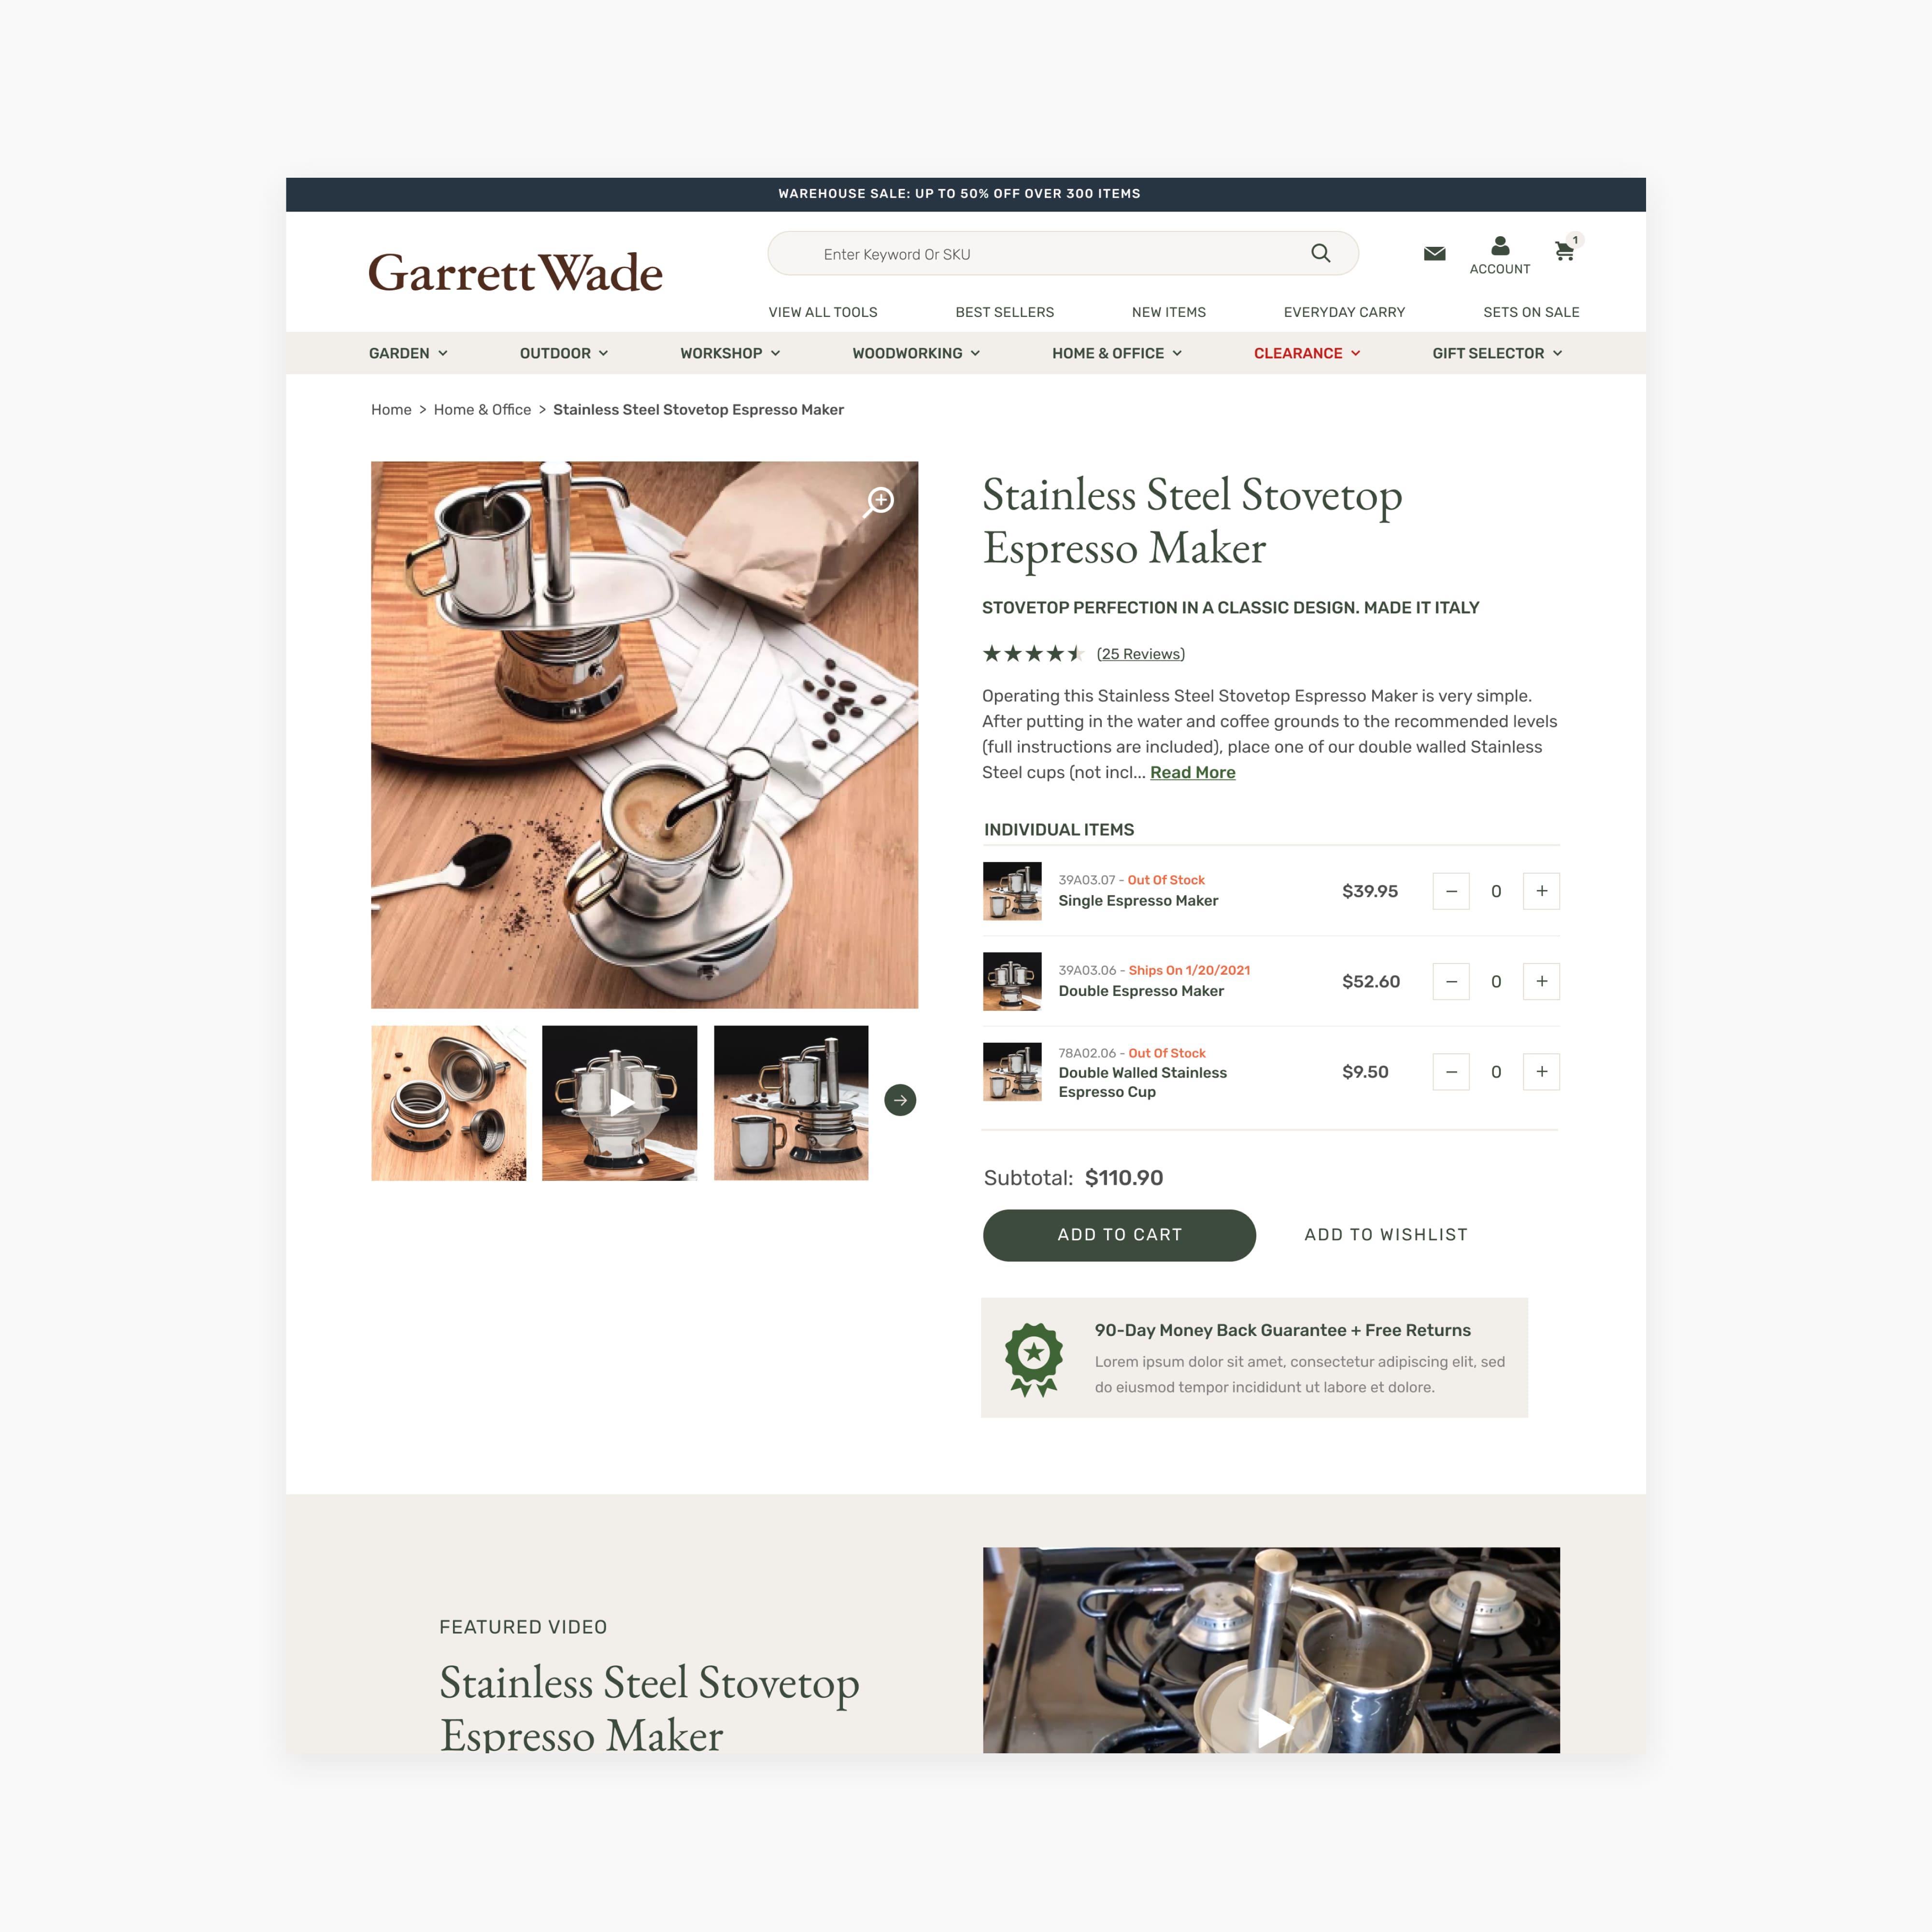 Garrett Wade: Product Detail Page Using BigCommerce